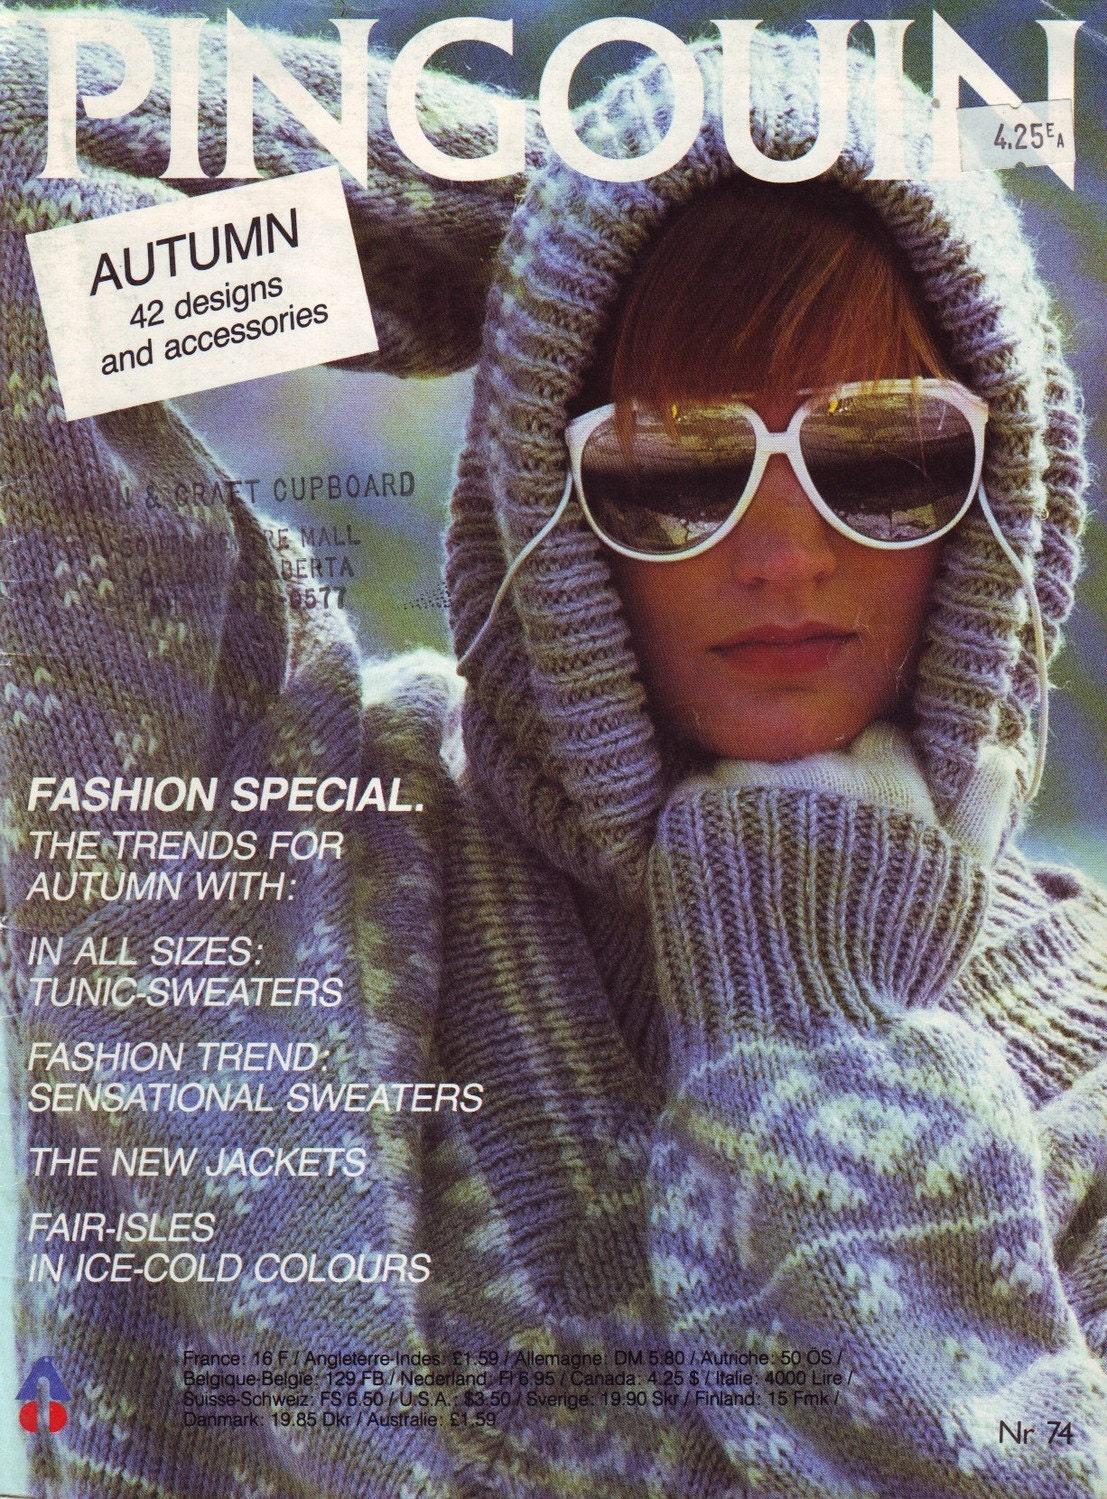 Pingouin Knitting Pattern Books : pingouin 74 vintage 80s knitting pattern book by vintagevice